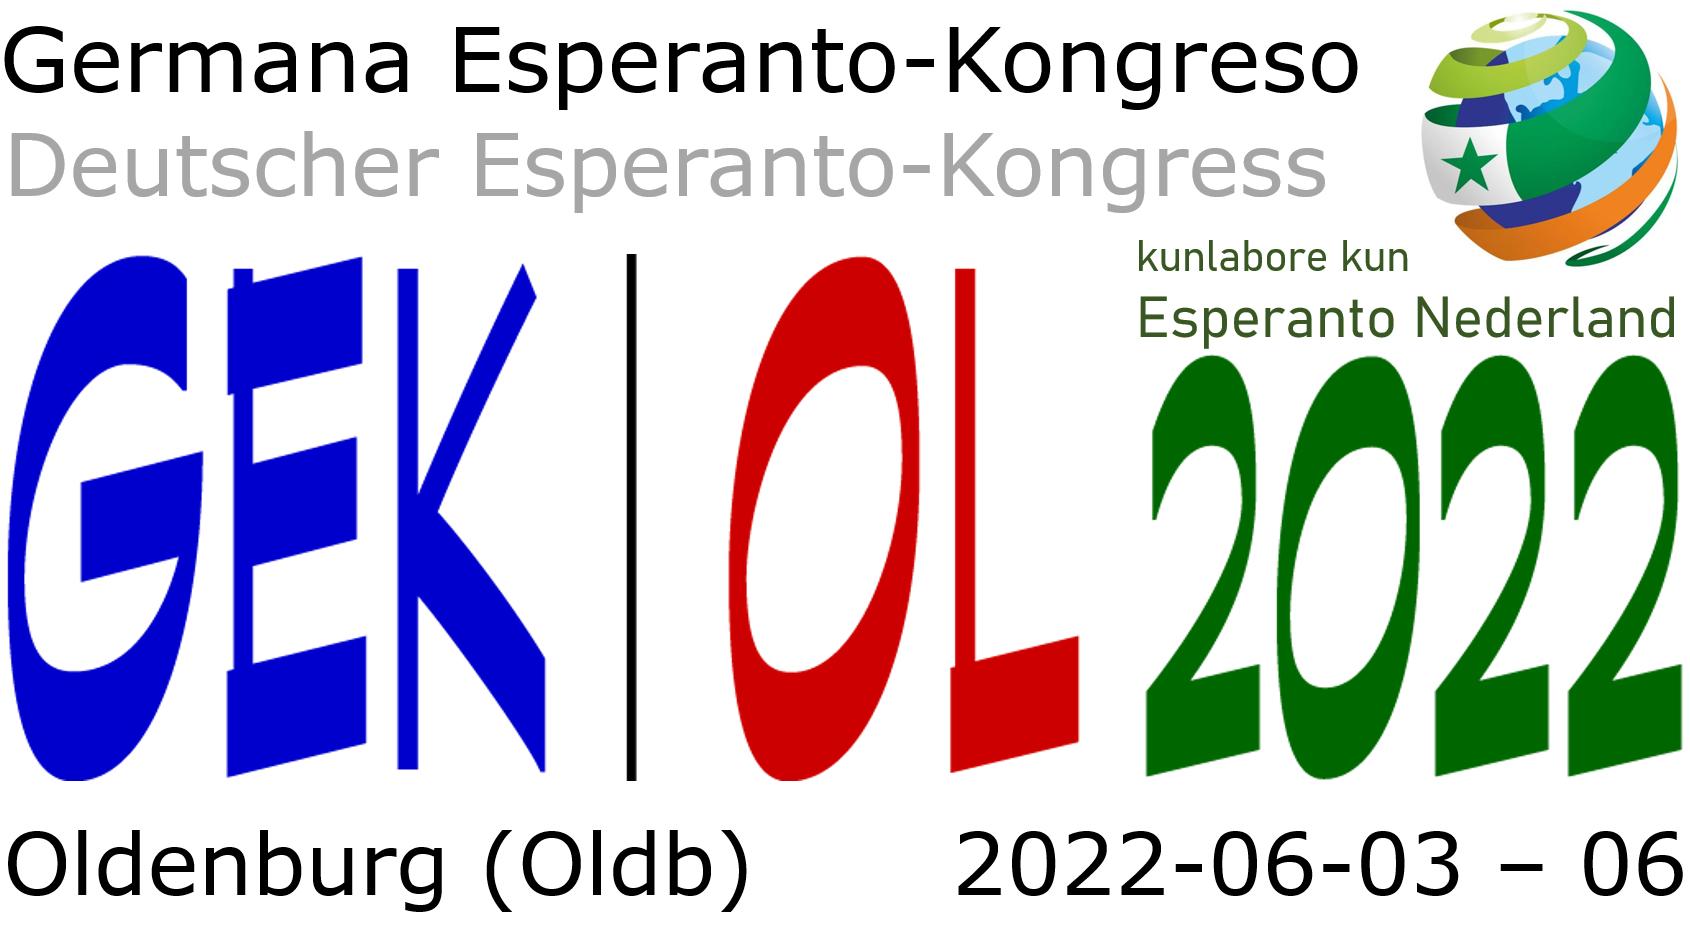 Germana Esperanto-Kongreso Oldenburg 2022